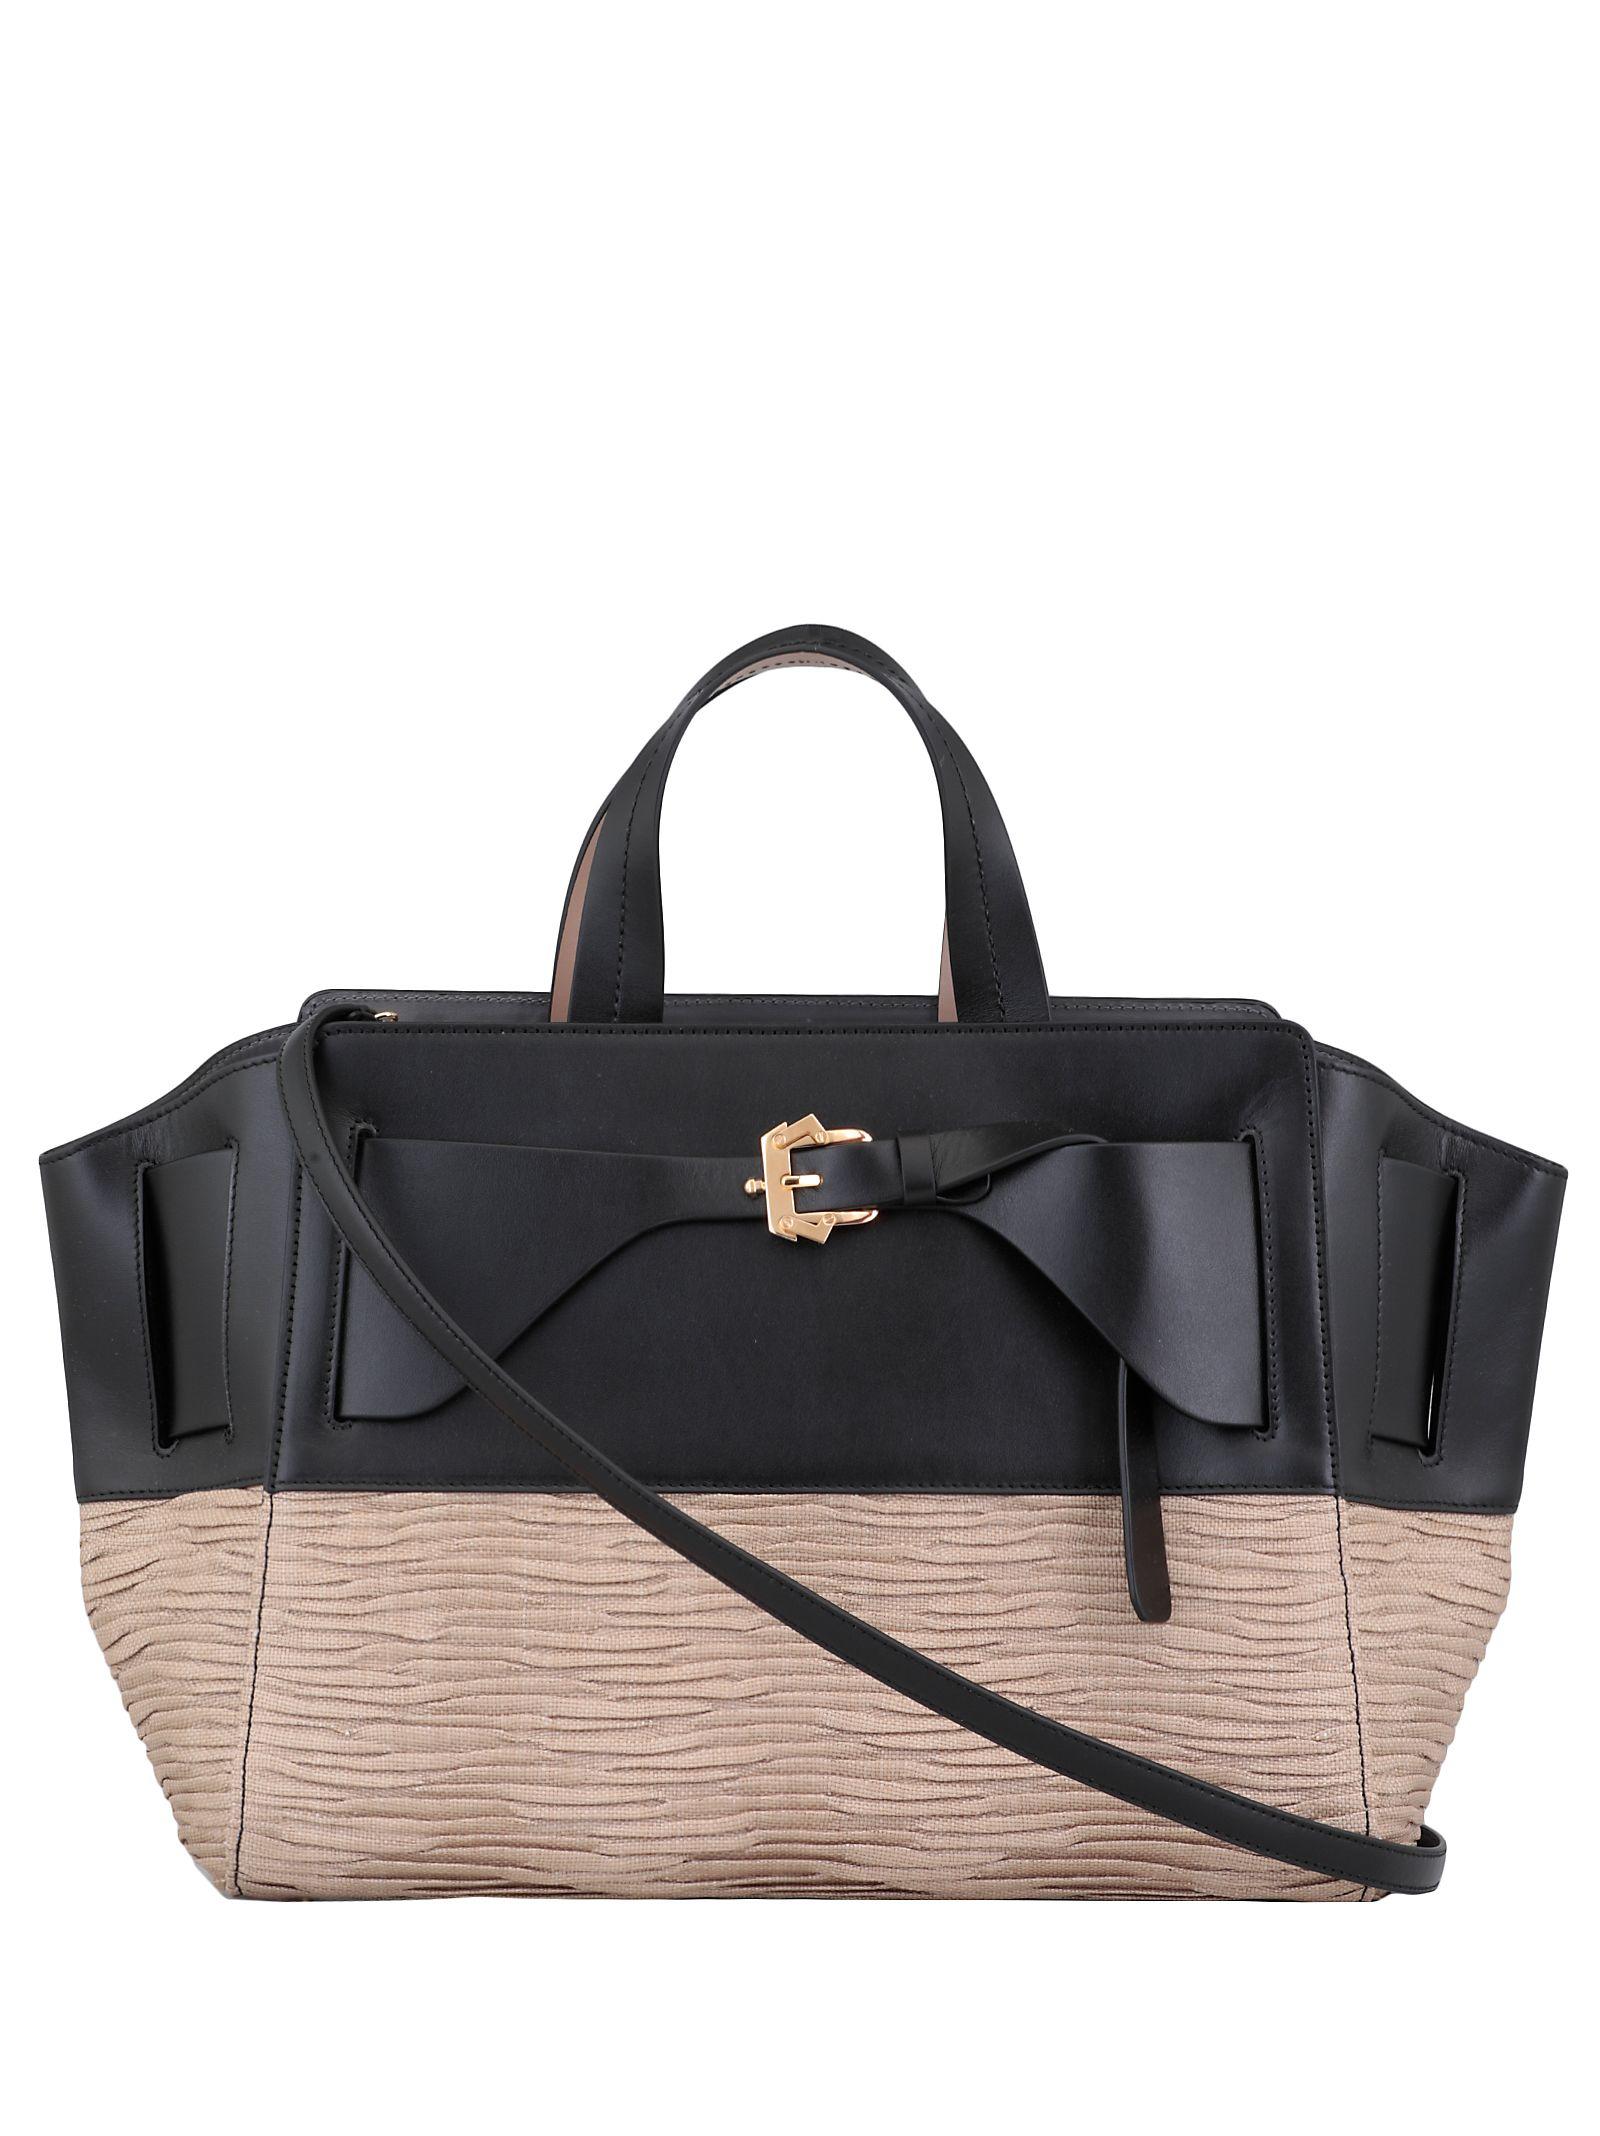 Paula Cademartori Dede Bag